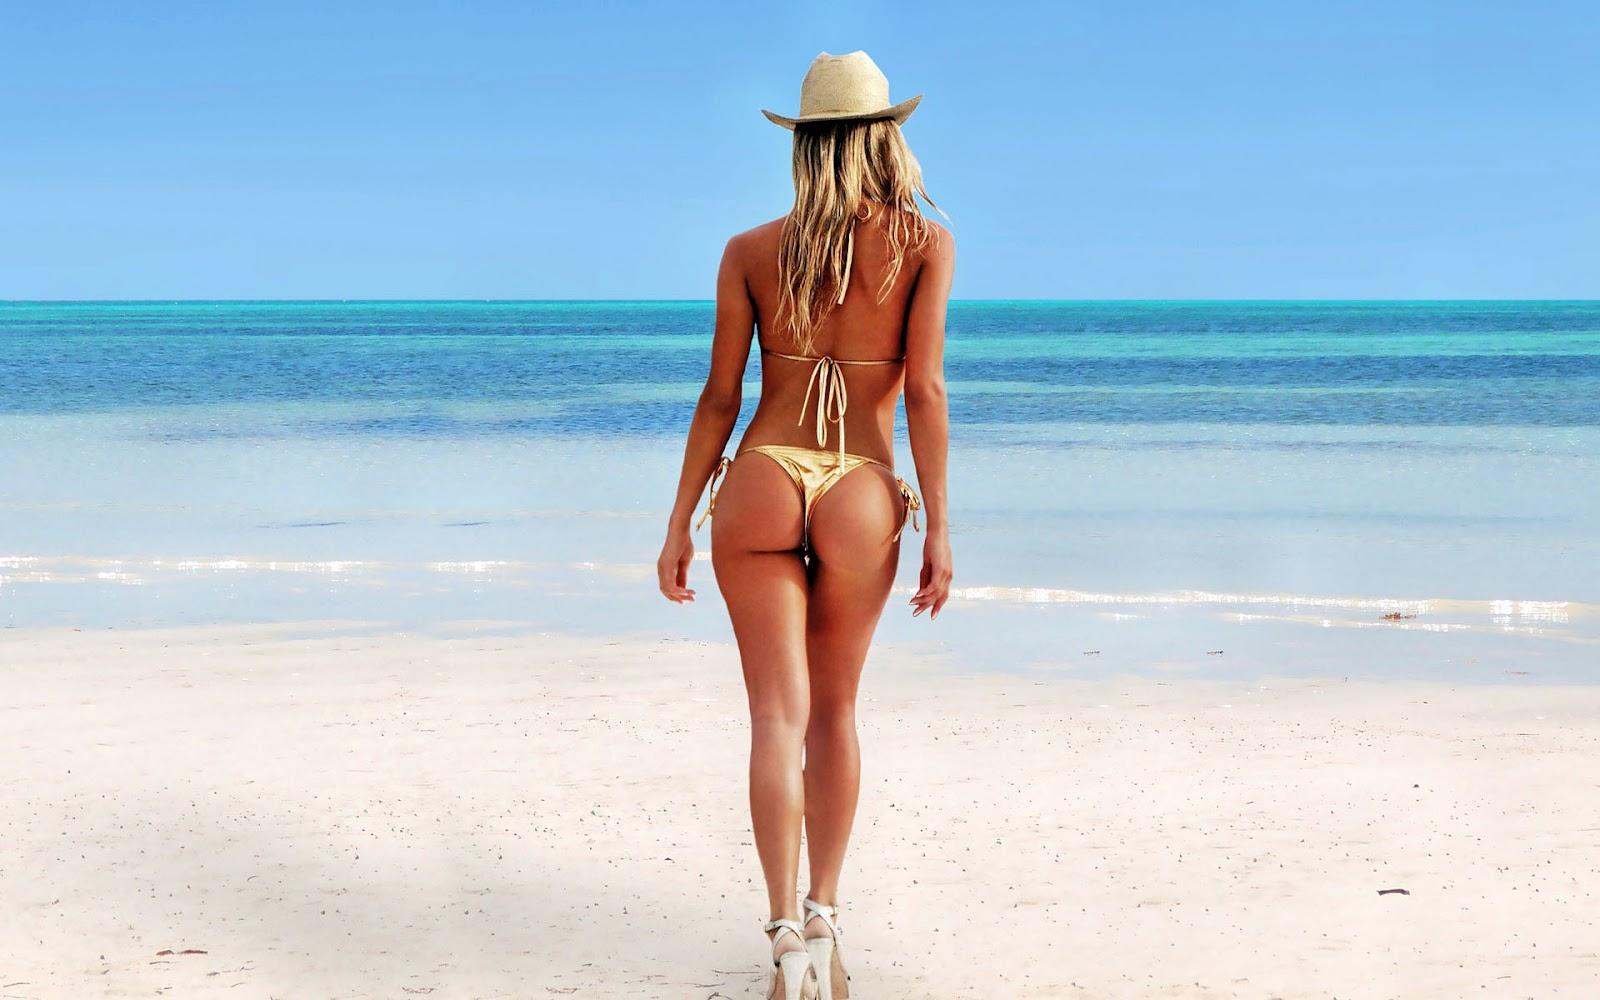 gratis chatten sex mooie vrouwen bikini